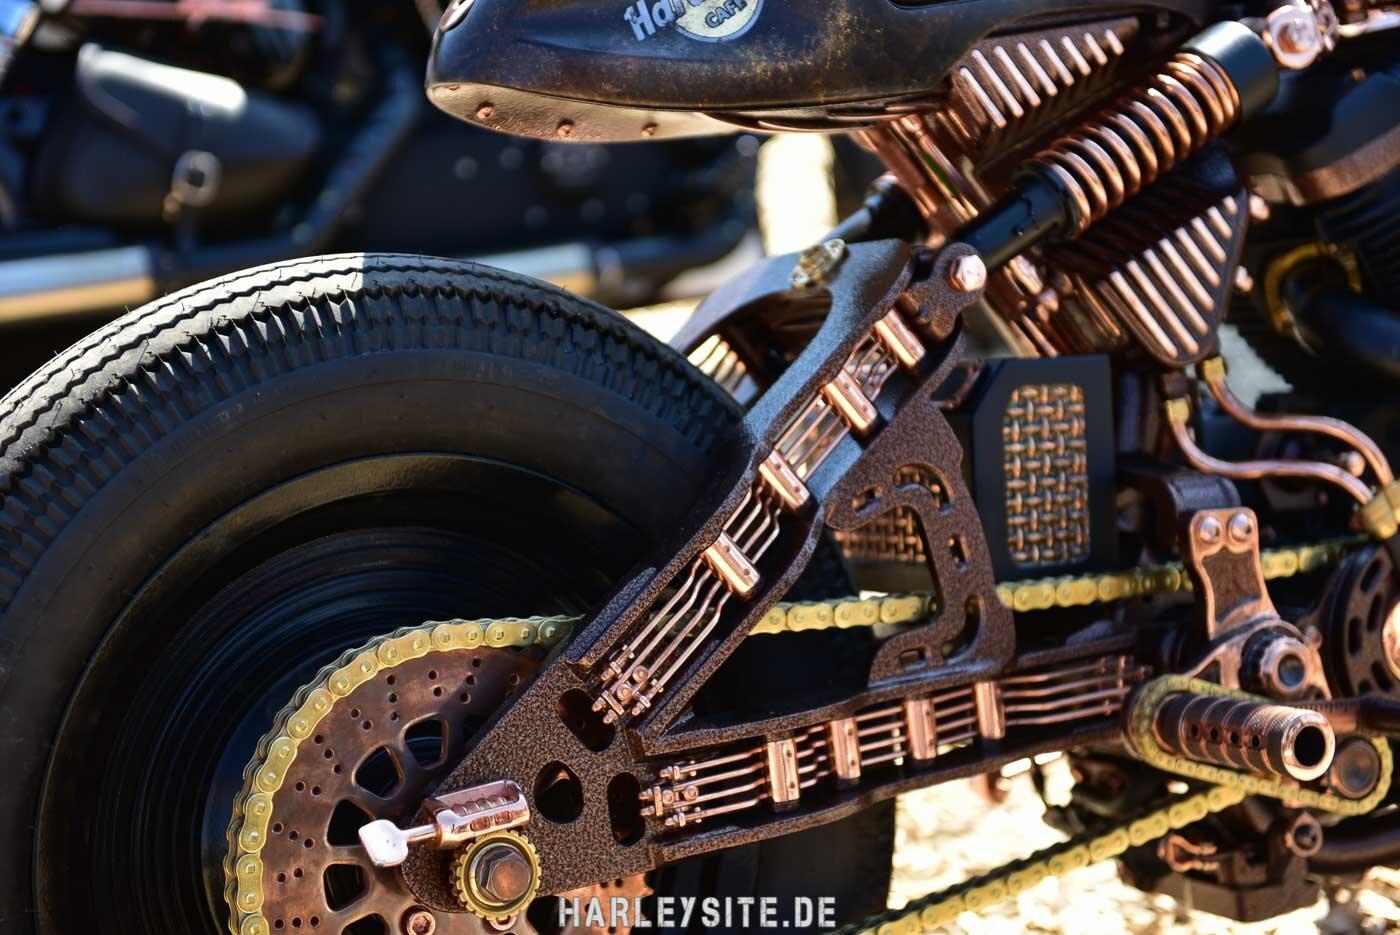 European-Bike-Week-91